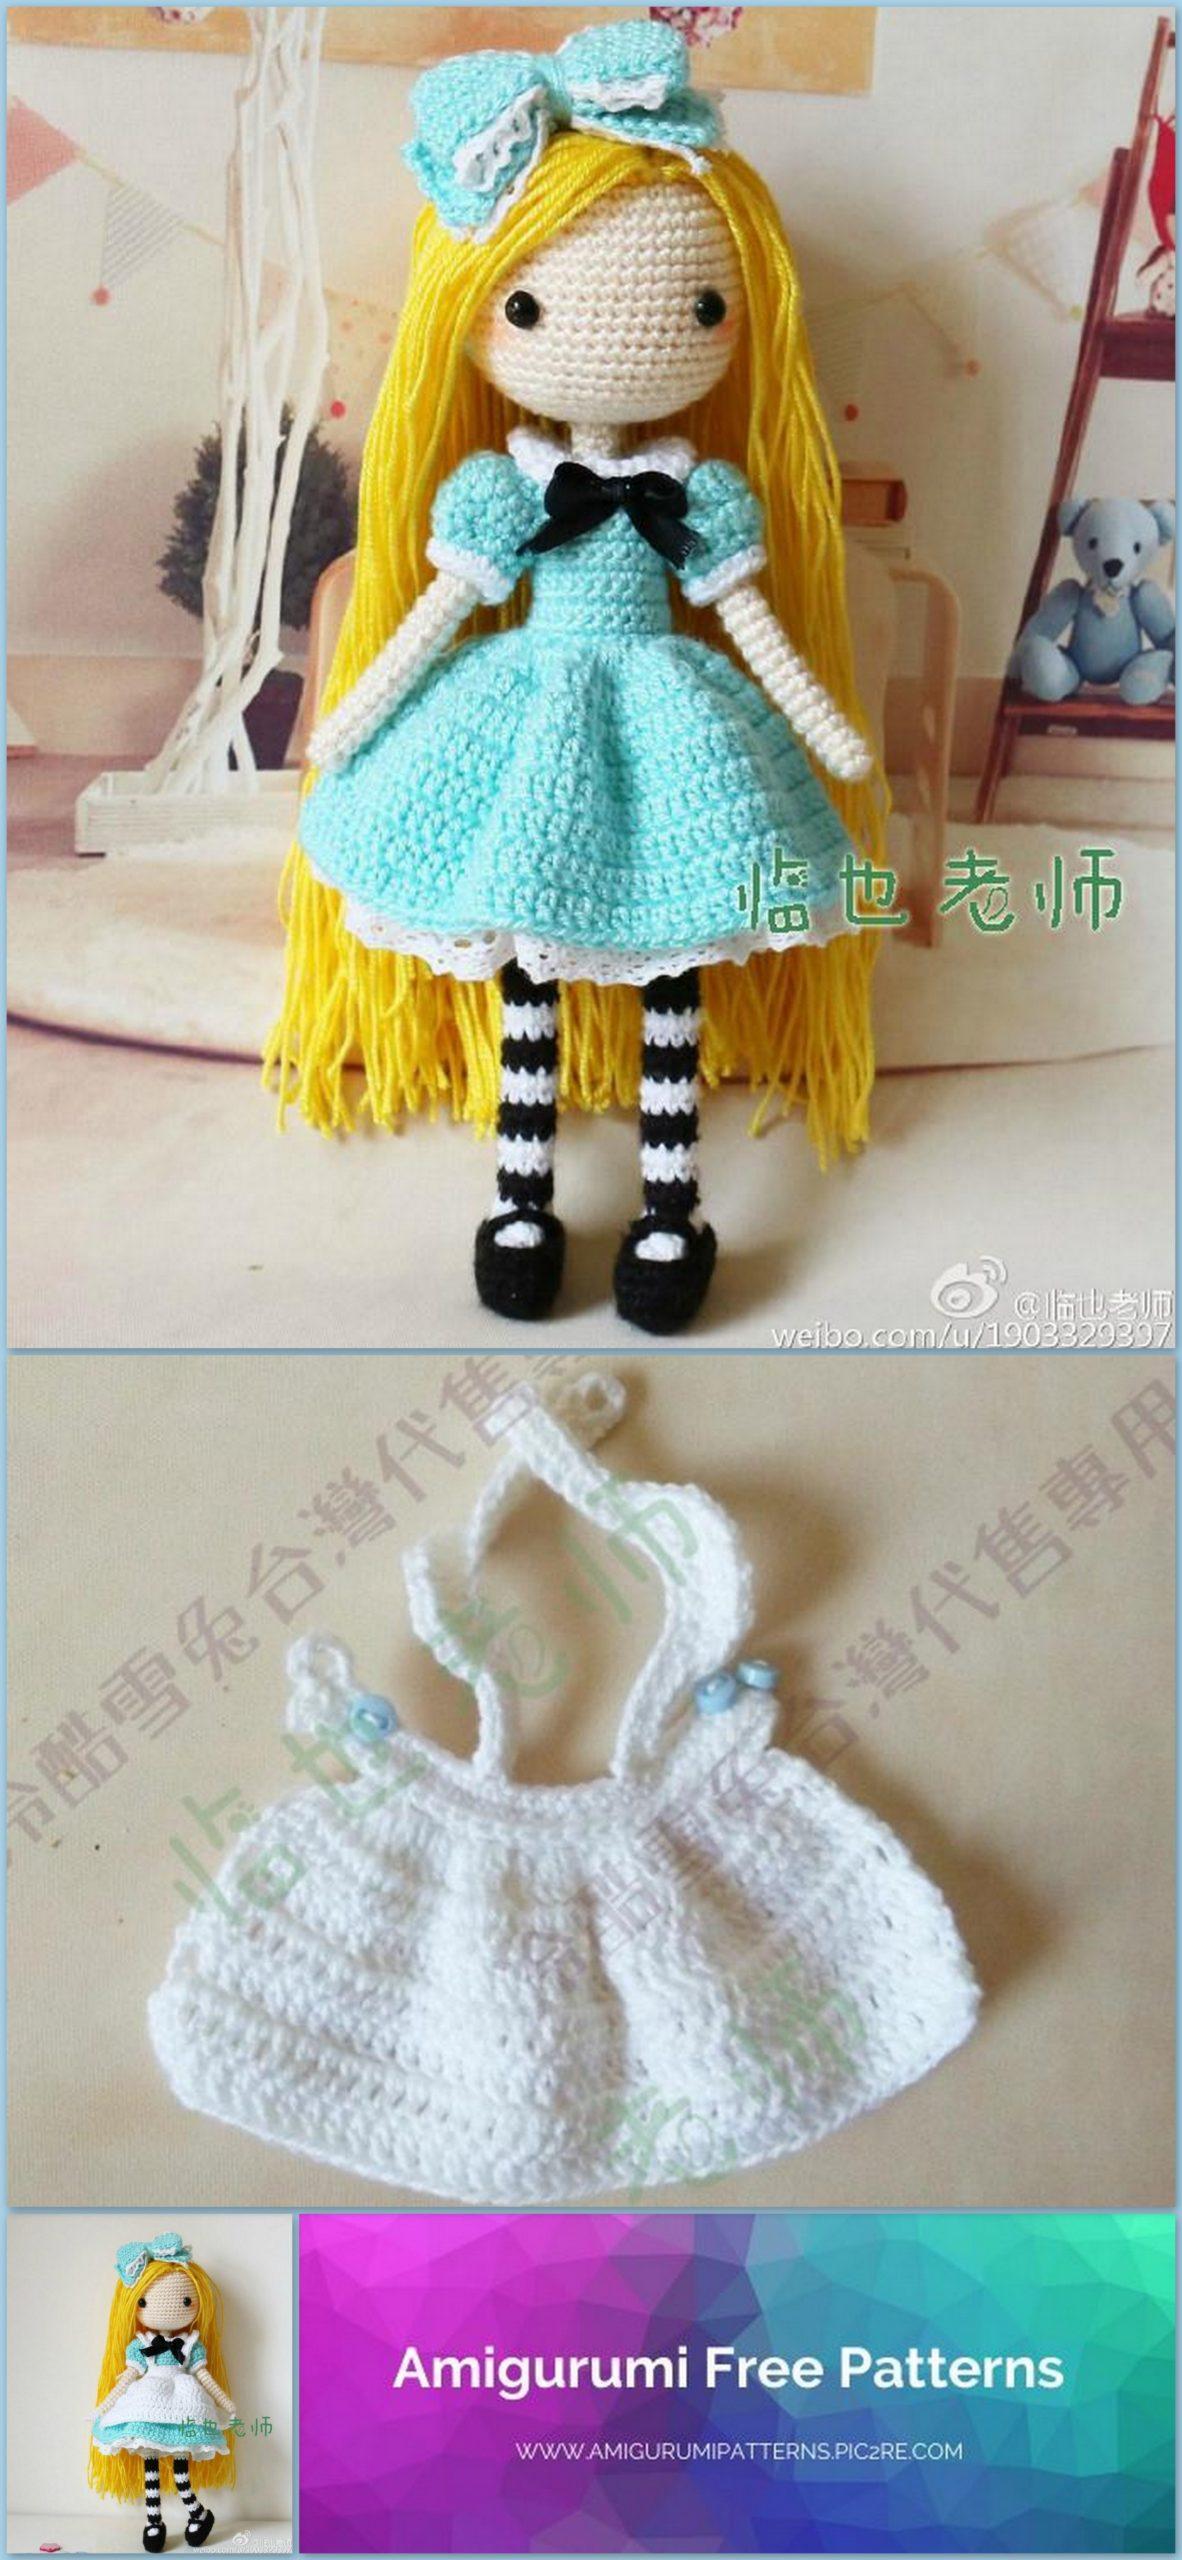 Weibo Crochet Activity - 依然 🍂 Hello Autumn 🍂 Pattern by 醉梦 ... | 2560x1182